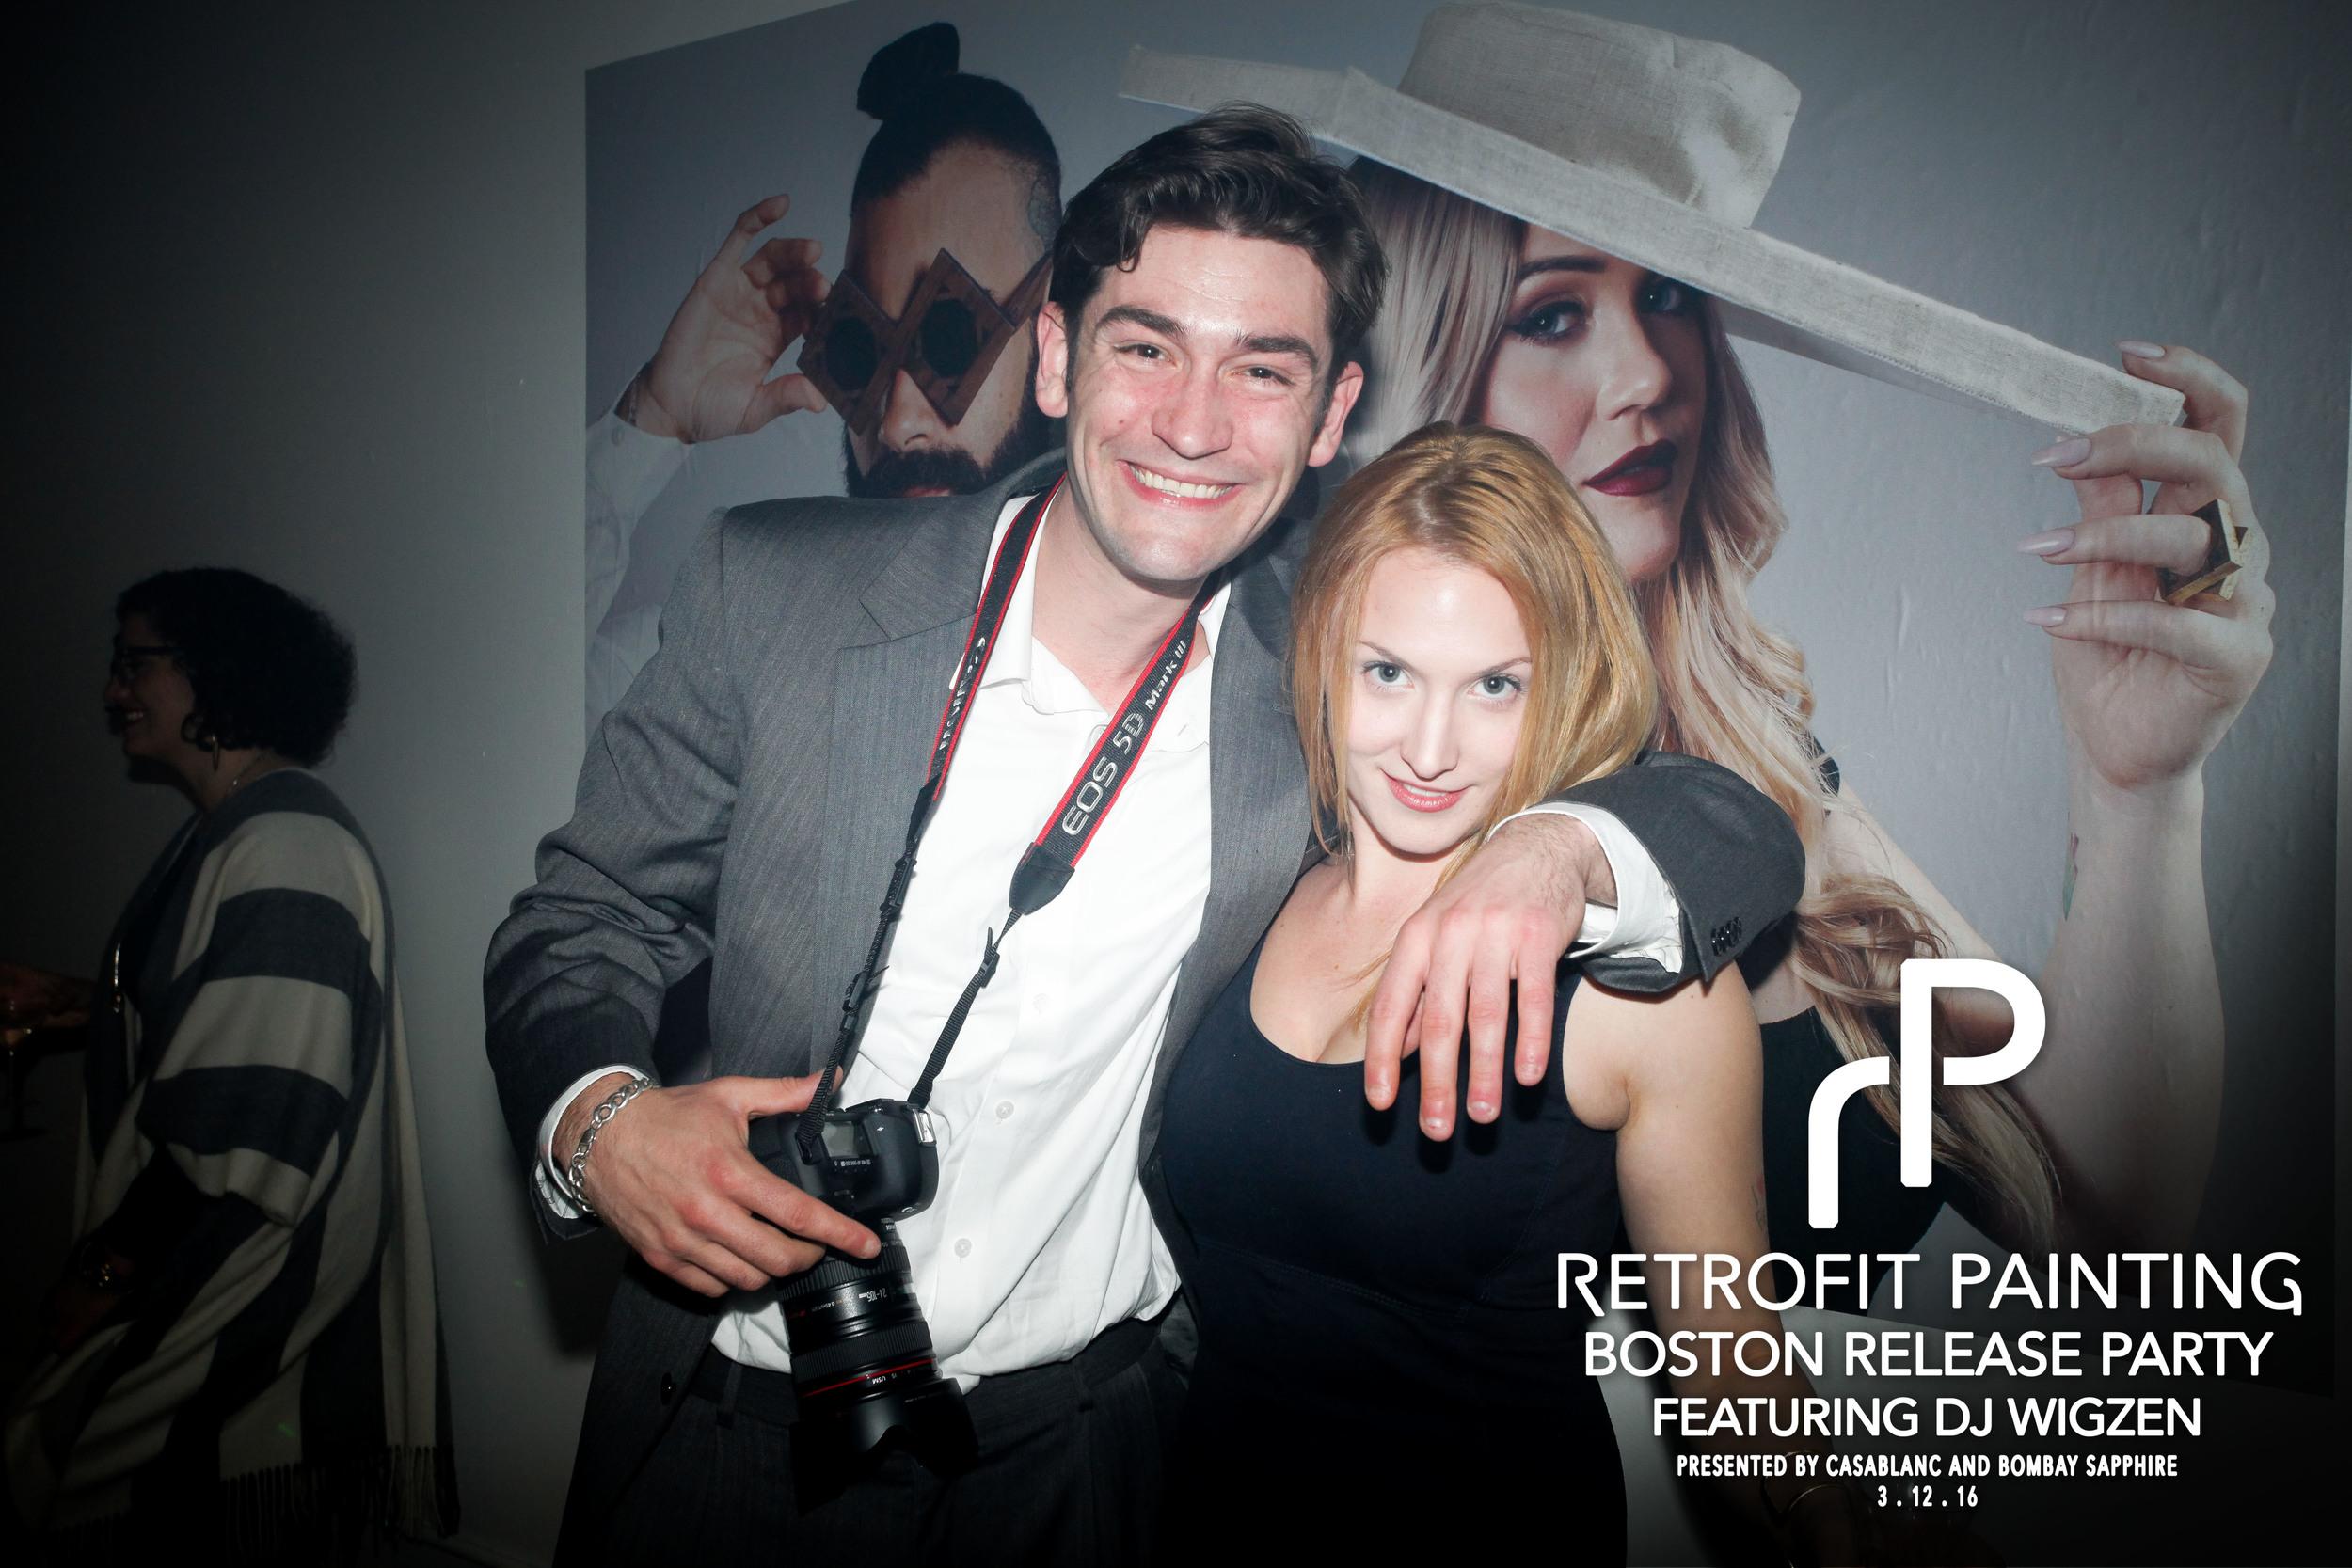 Retrofit Painting Boston Release Party 0047.jpg